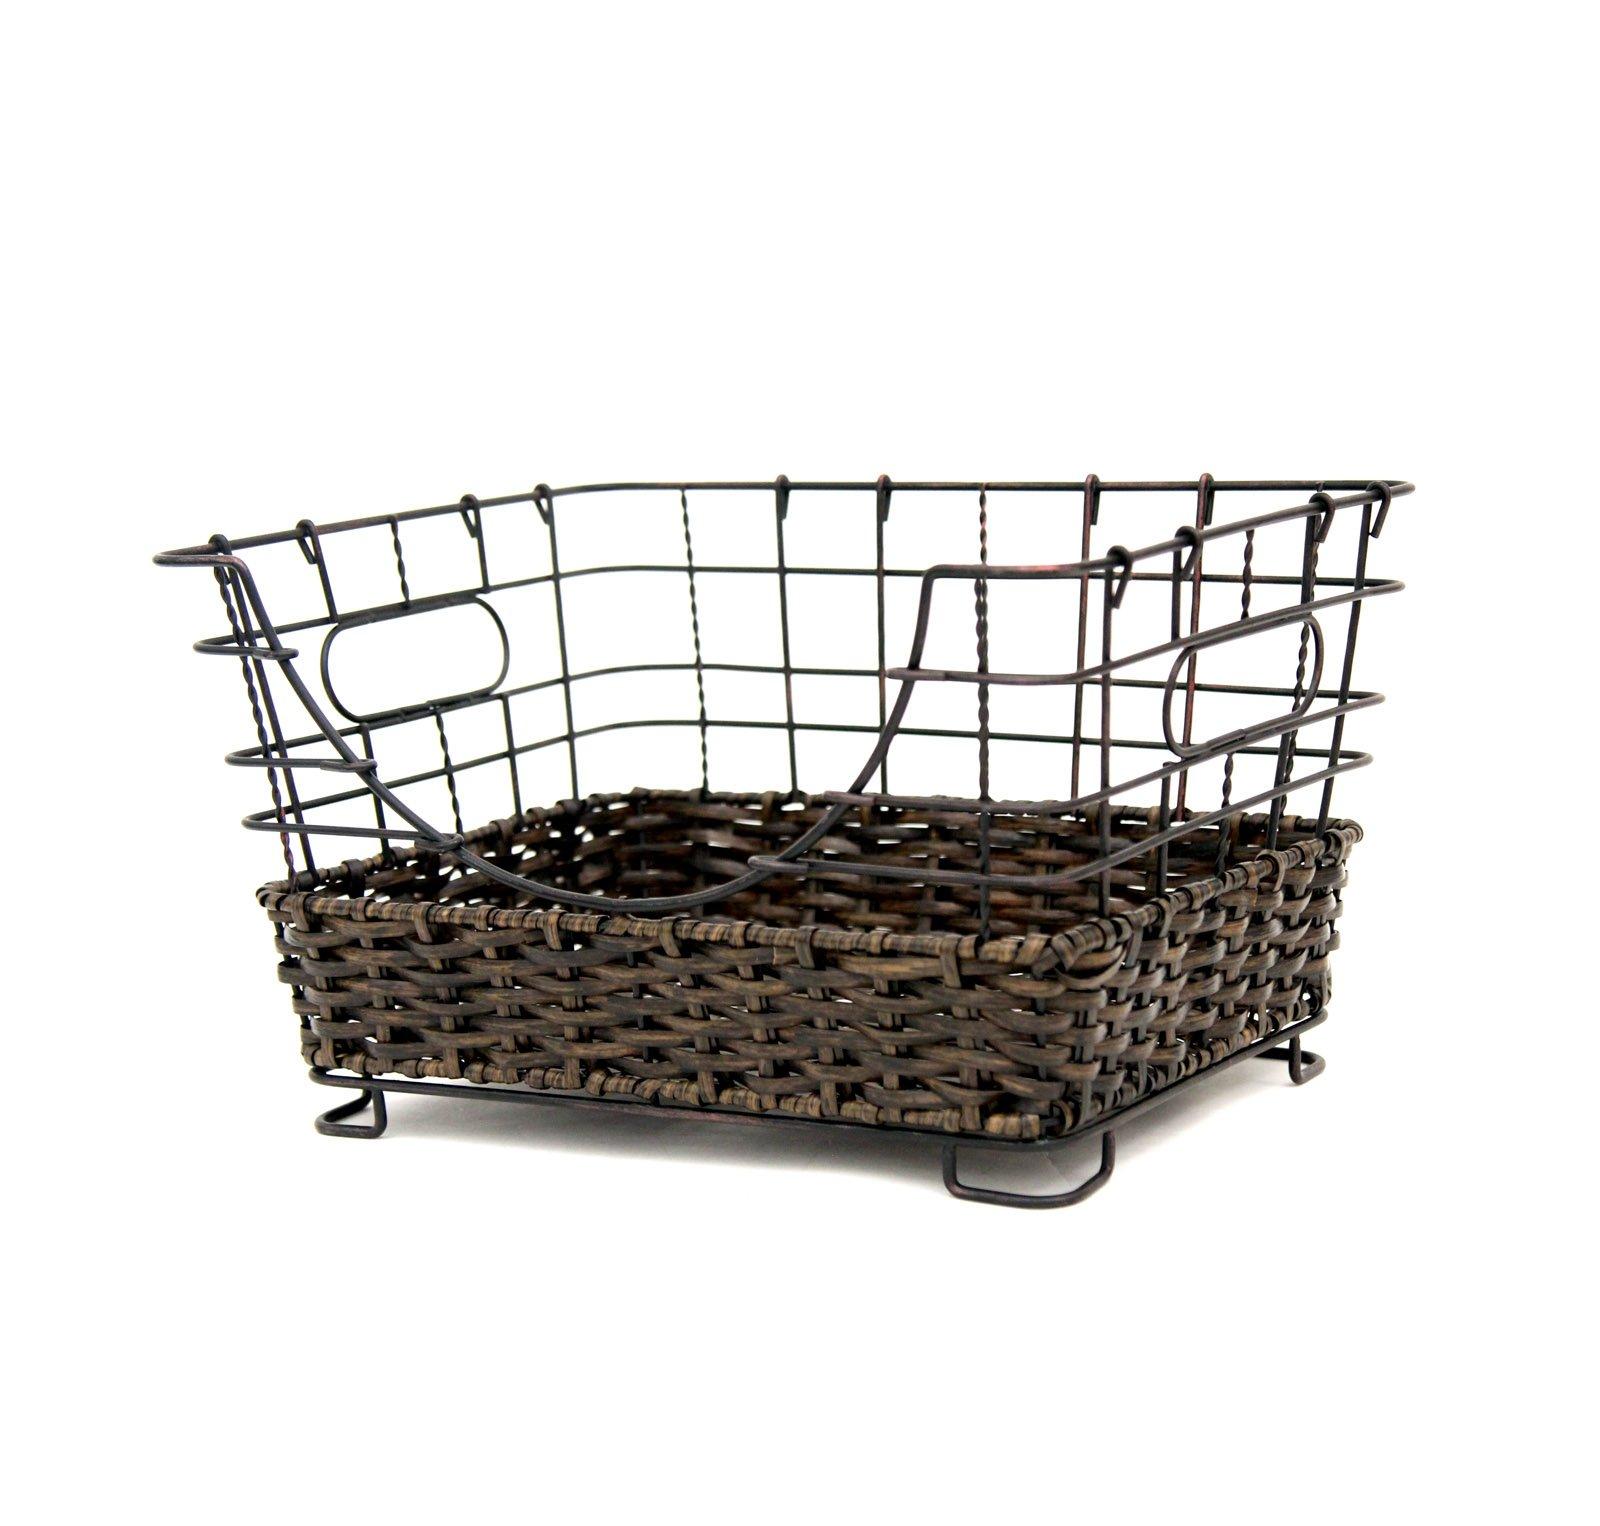 Mesa 1 Piece Antique Black Grid Metal Basket with Rustic Woven Accents Finished: Antique Black by Vanderbilt Home